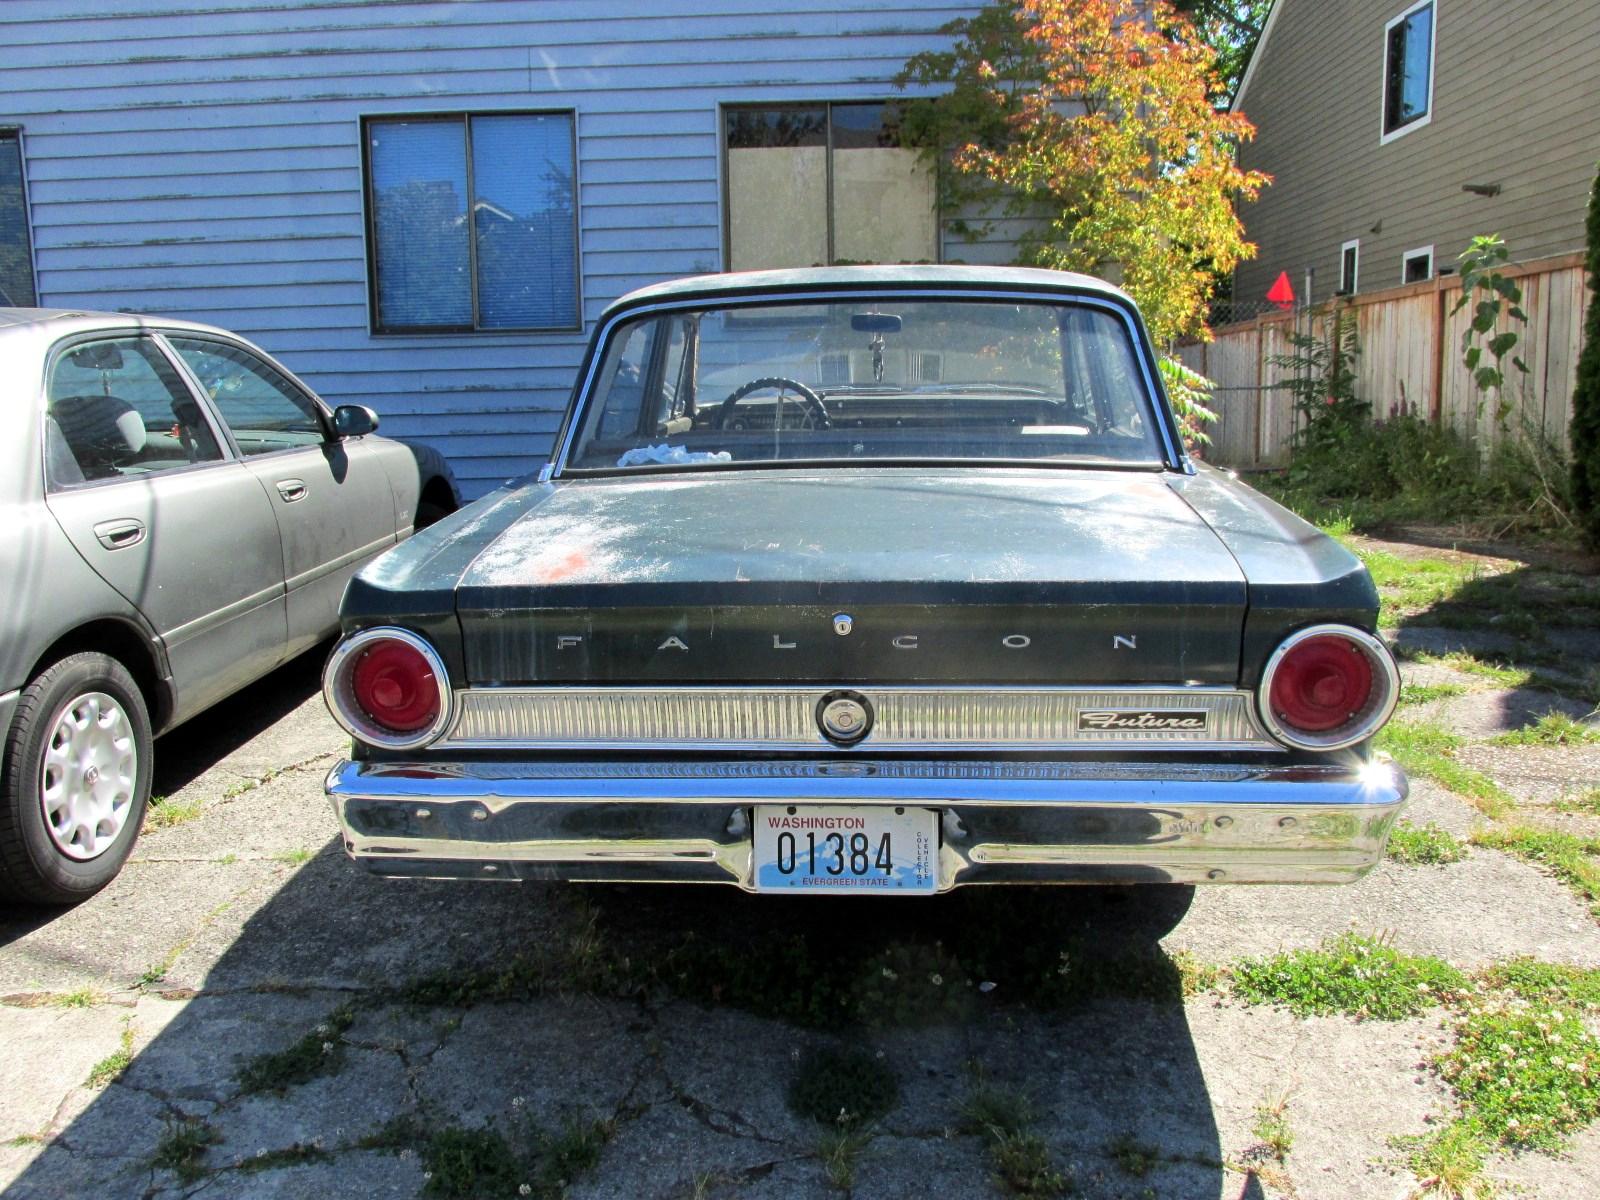 Seattles Classics 1964 Ford Falcon Futura Sedan